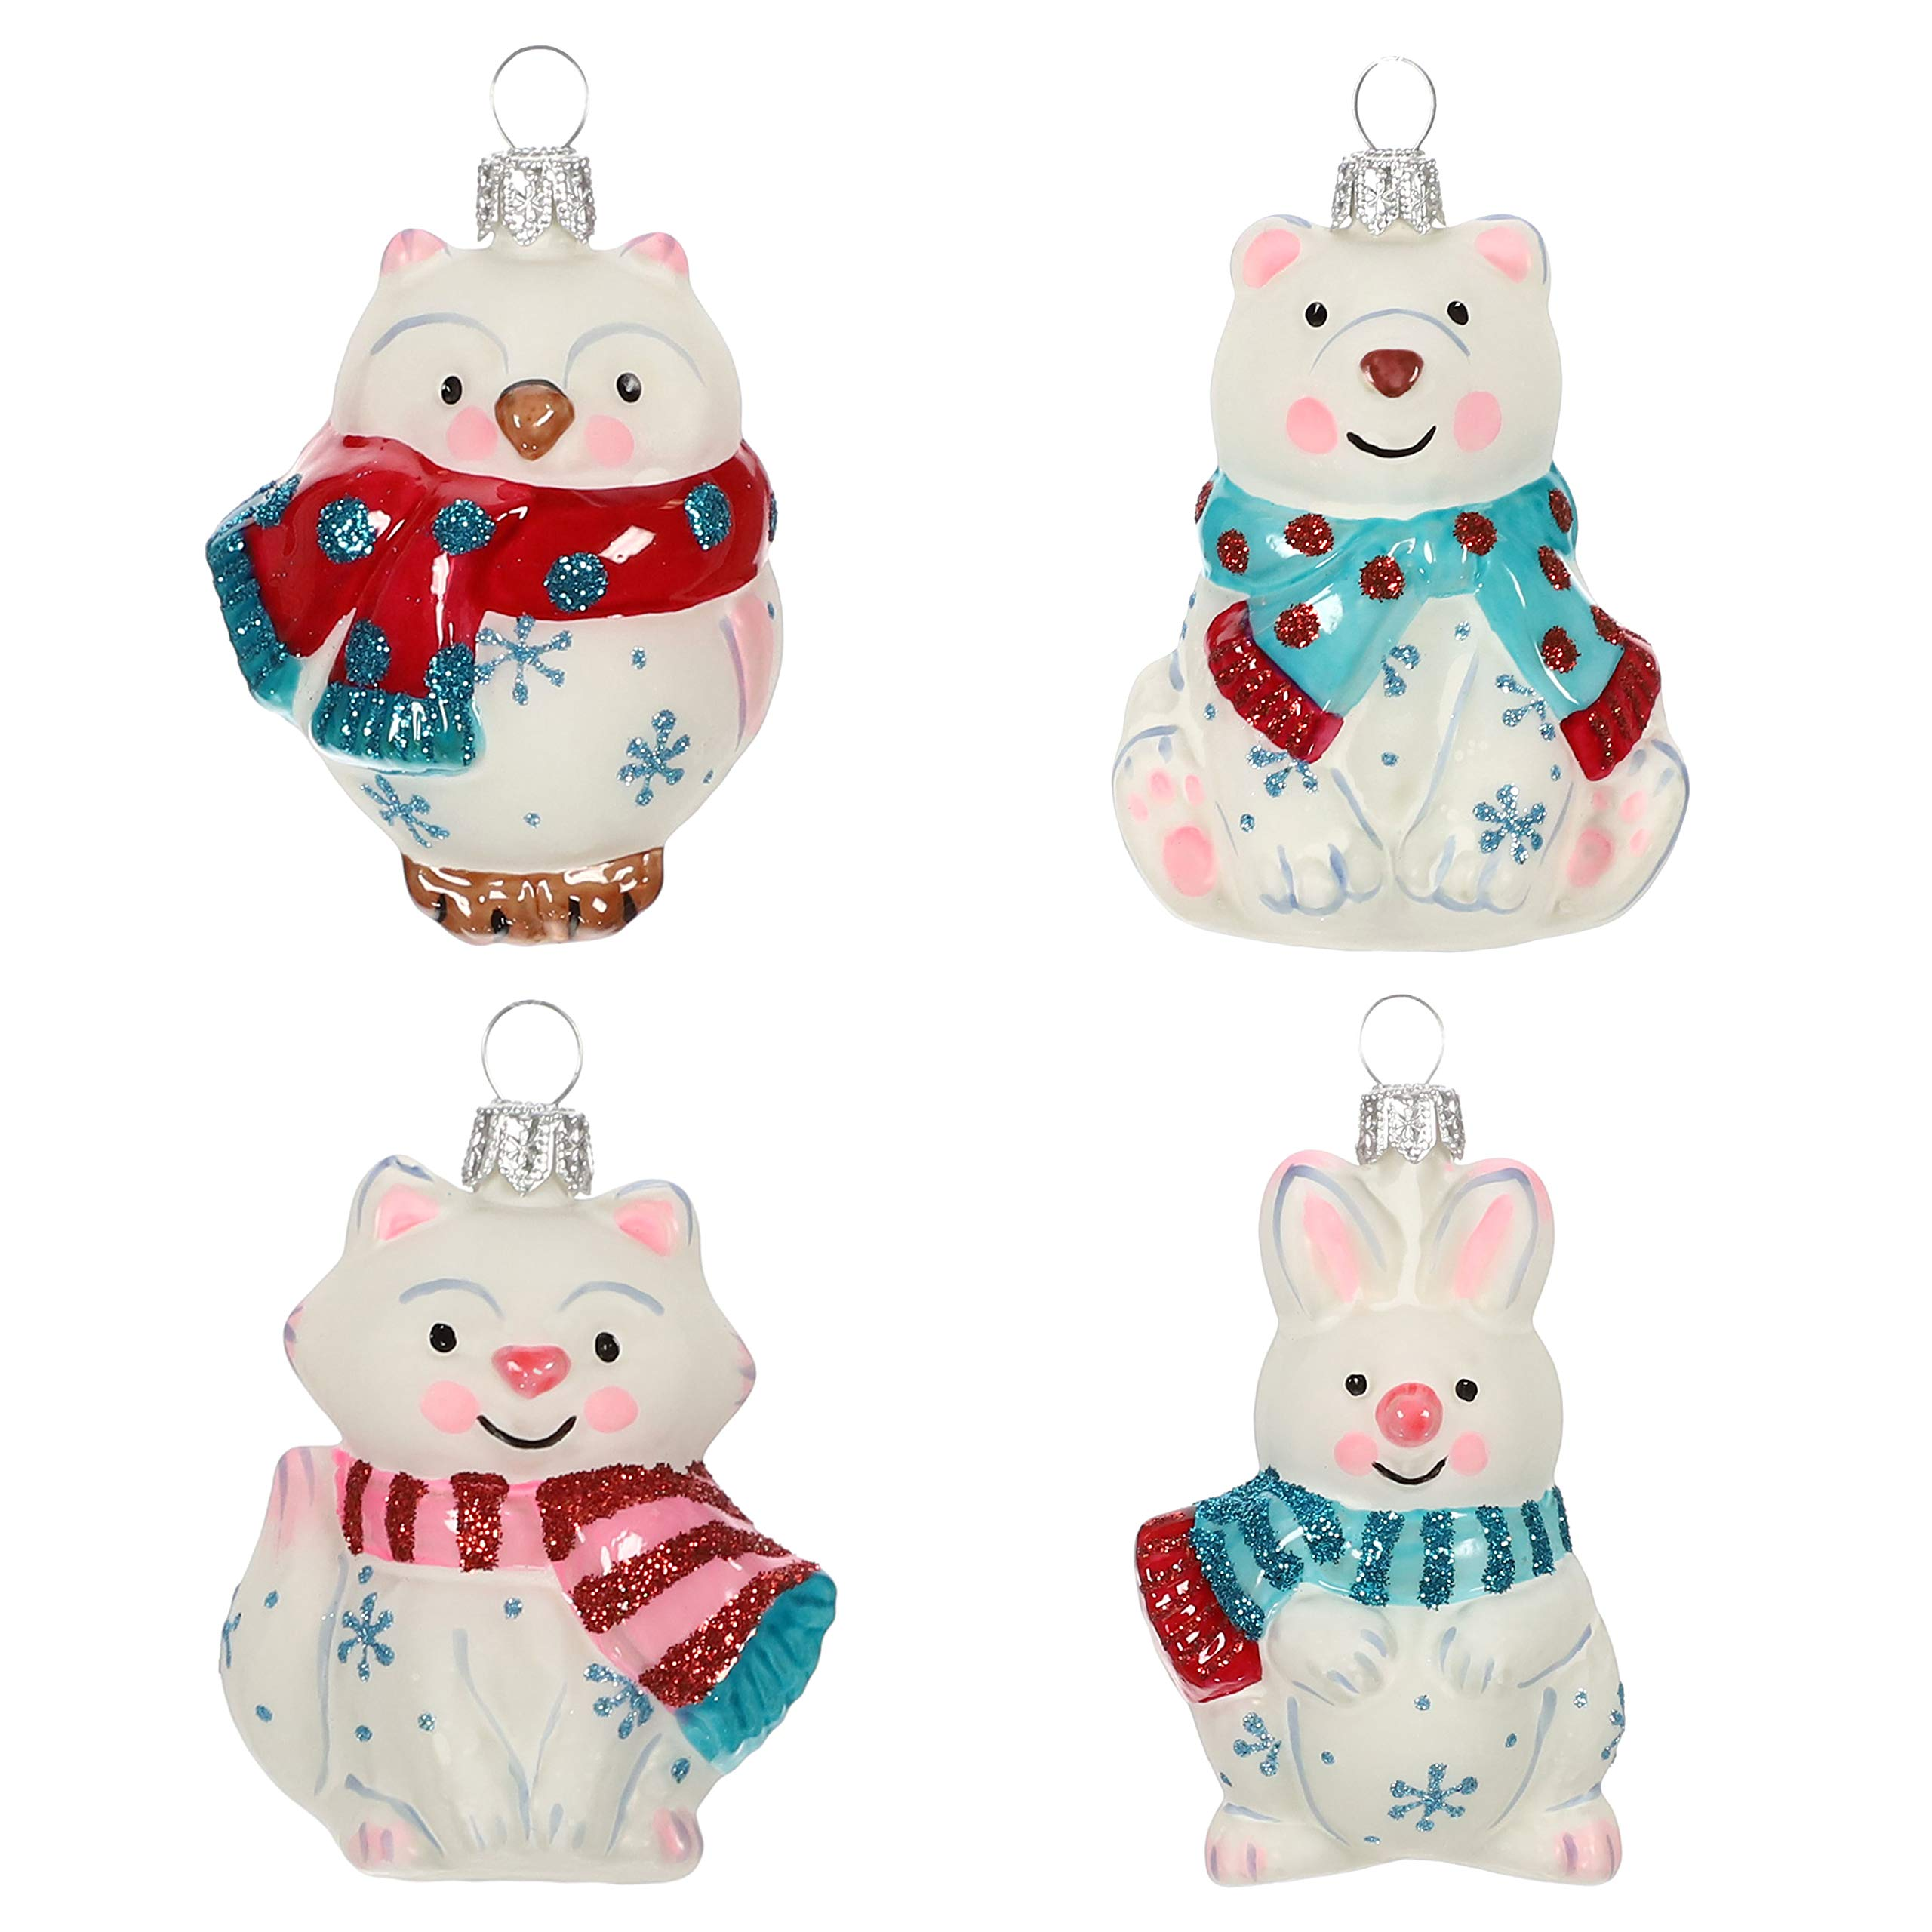 Hallmark Keepsake Mini Christmas 2019 Year Dated Arctic Friends Animals Miniature Blown Glass Ornament, Set of 4, 4 Count